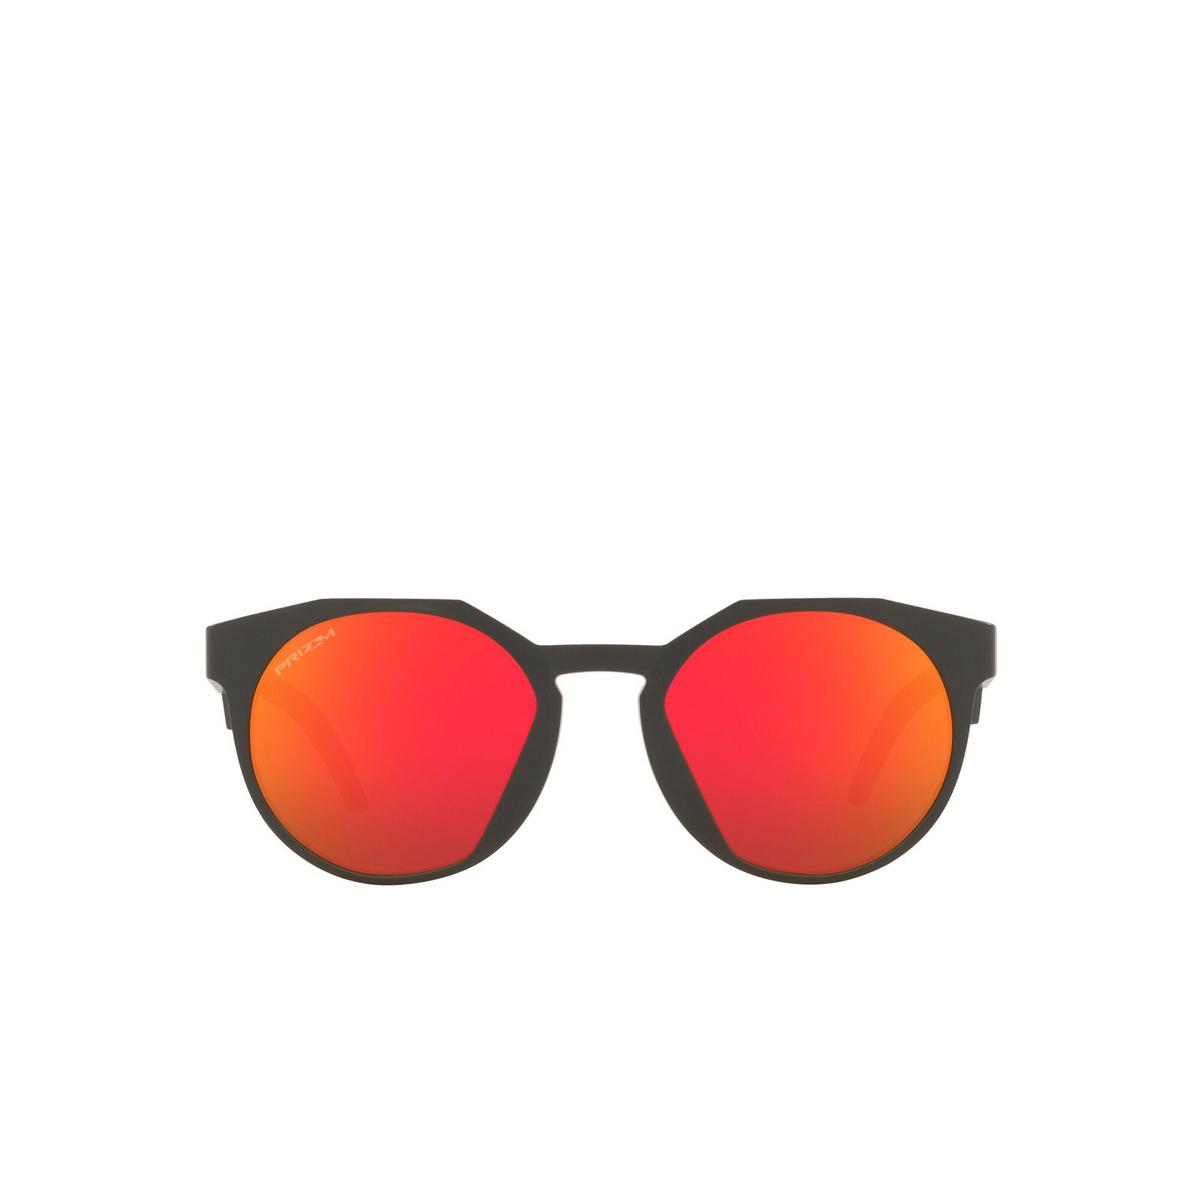 Oakley® Round Sunglasses: Hstn OO9464 color Matte Carbon 946403 - front view.